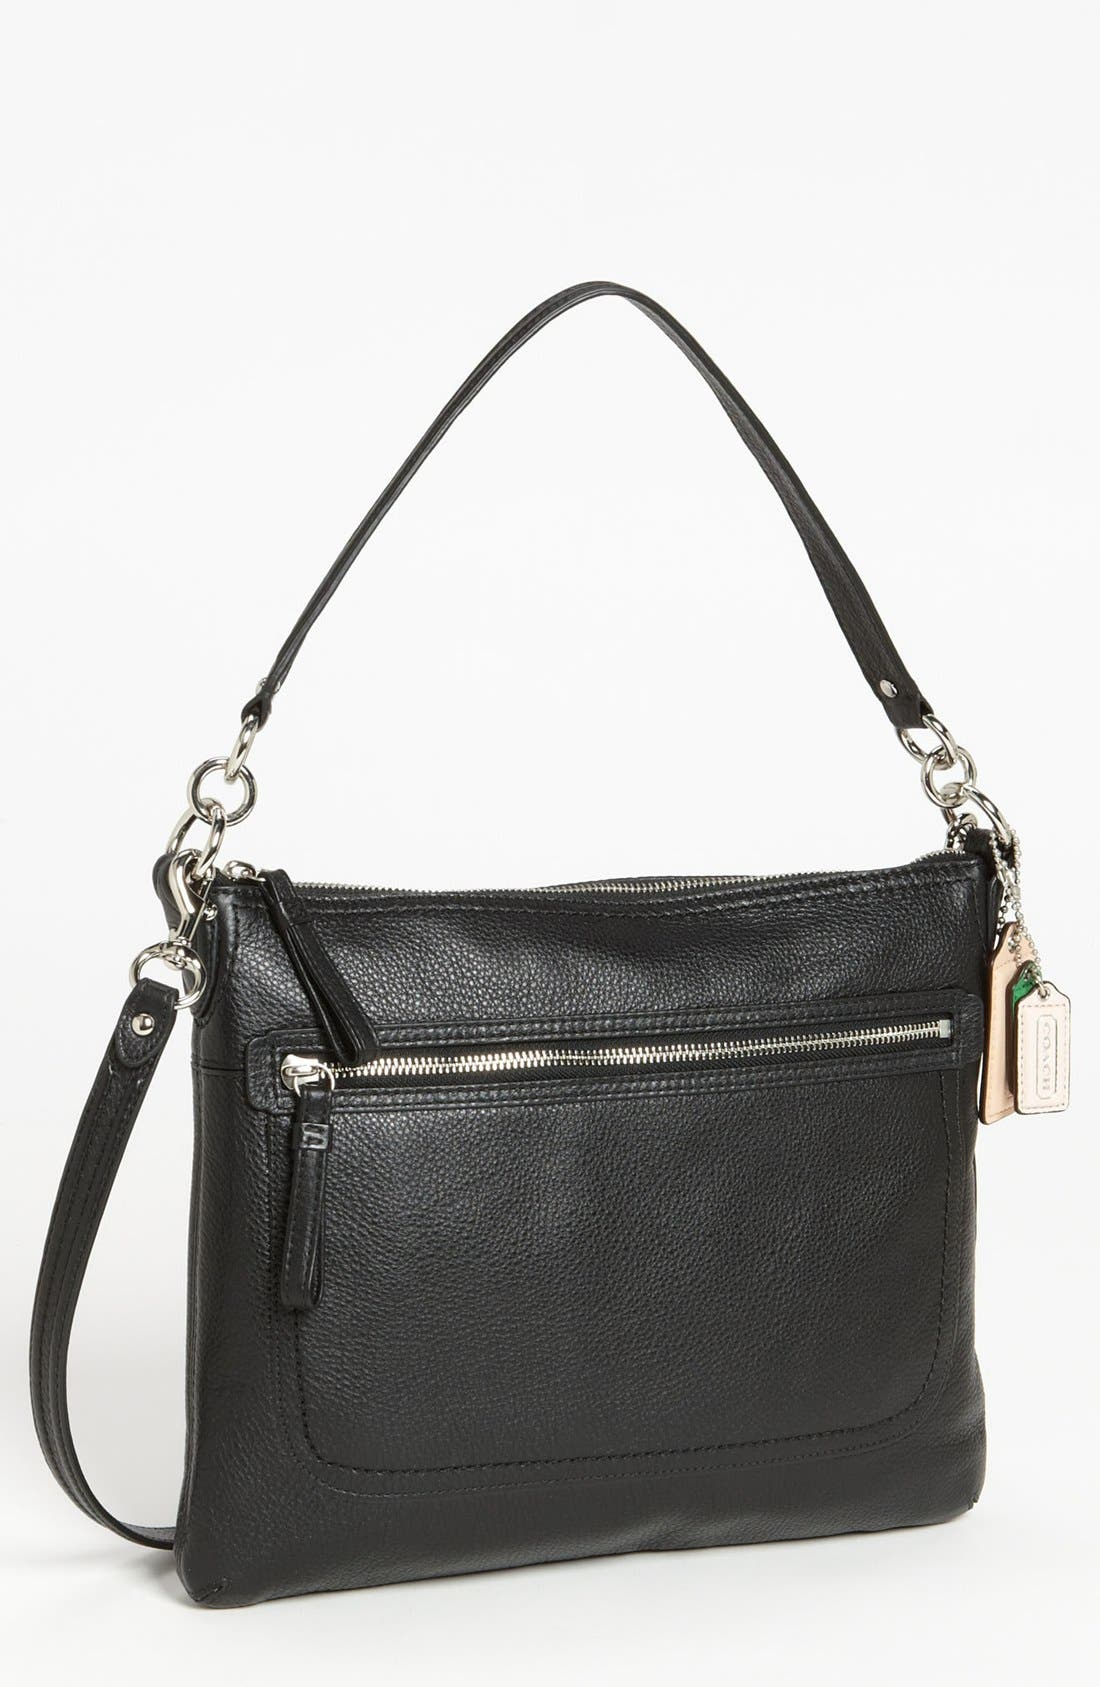 Alternate Image 1 Selected - COACH 'Poppy - Perri Hippie' Leather Crossbody Bag, Medium